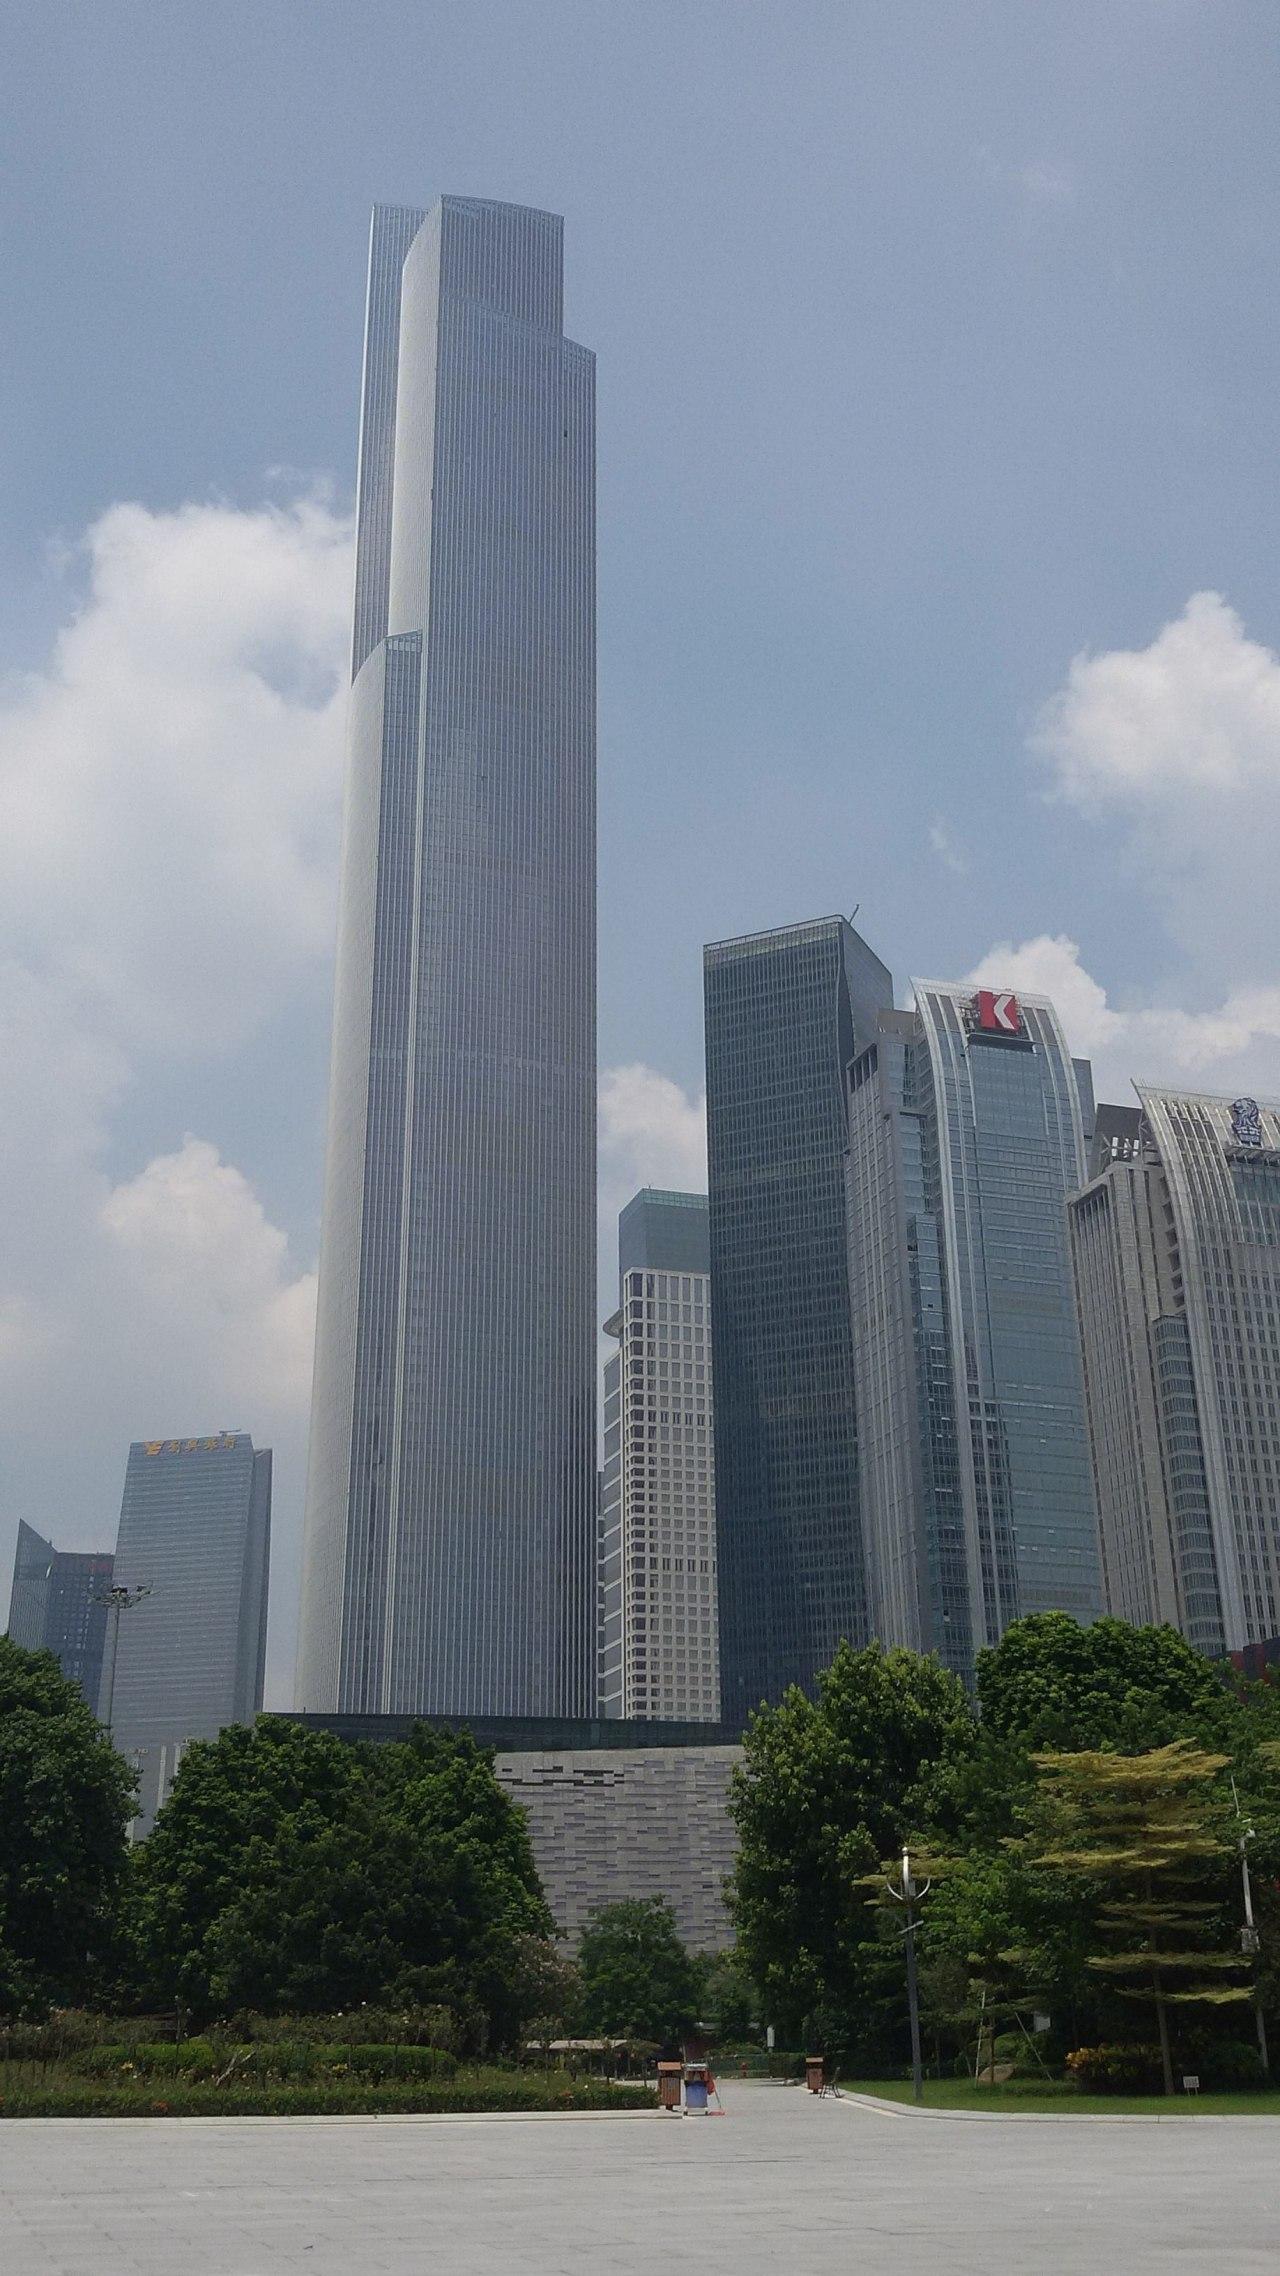 3. Guangzhou CTF Finance Centre – 530 m architecture, building, city, cloud, condominium, corporate headquarters, daytime, downtown, landmark, metropolis, metropolitan area, sky, skyline, skyscraper, tower, tower block, urban area, gray